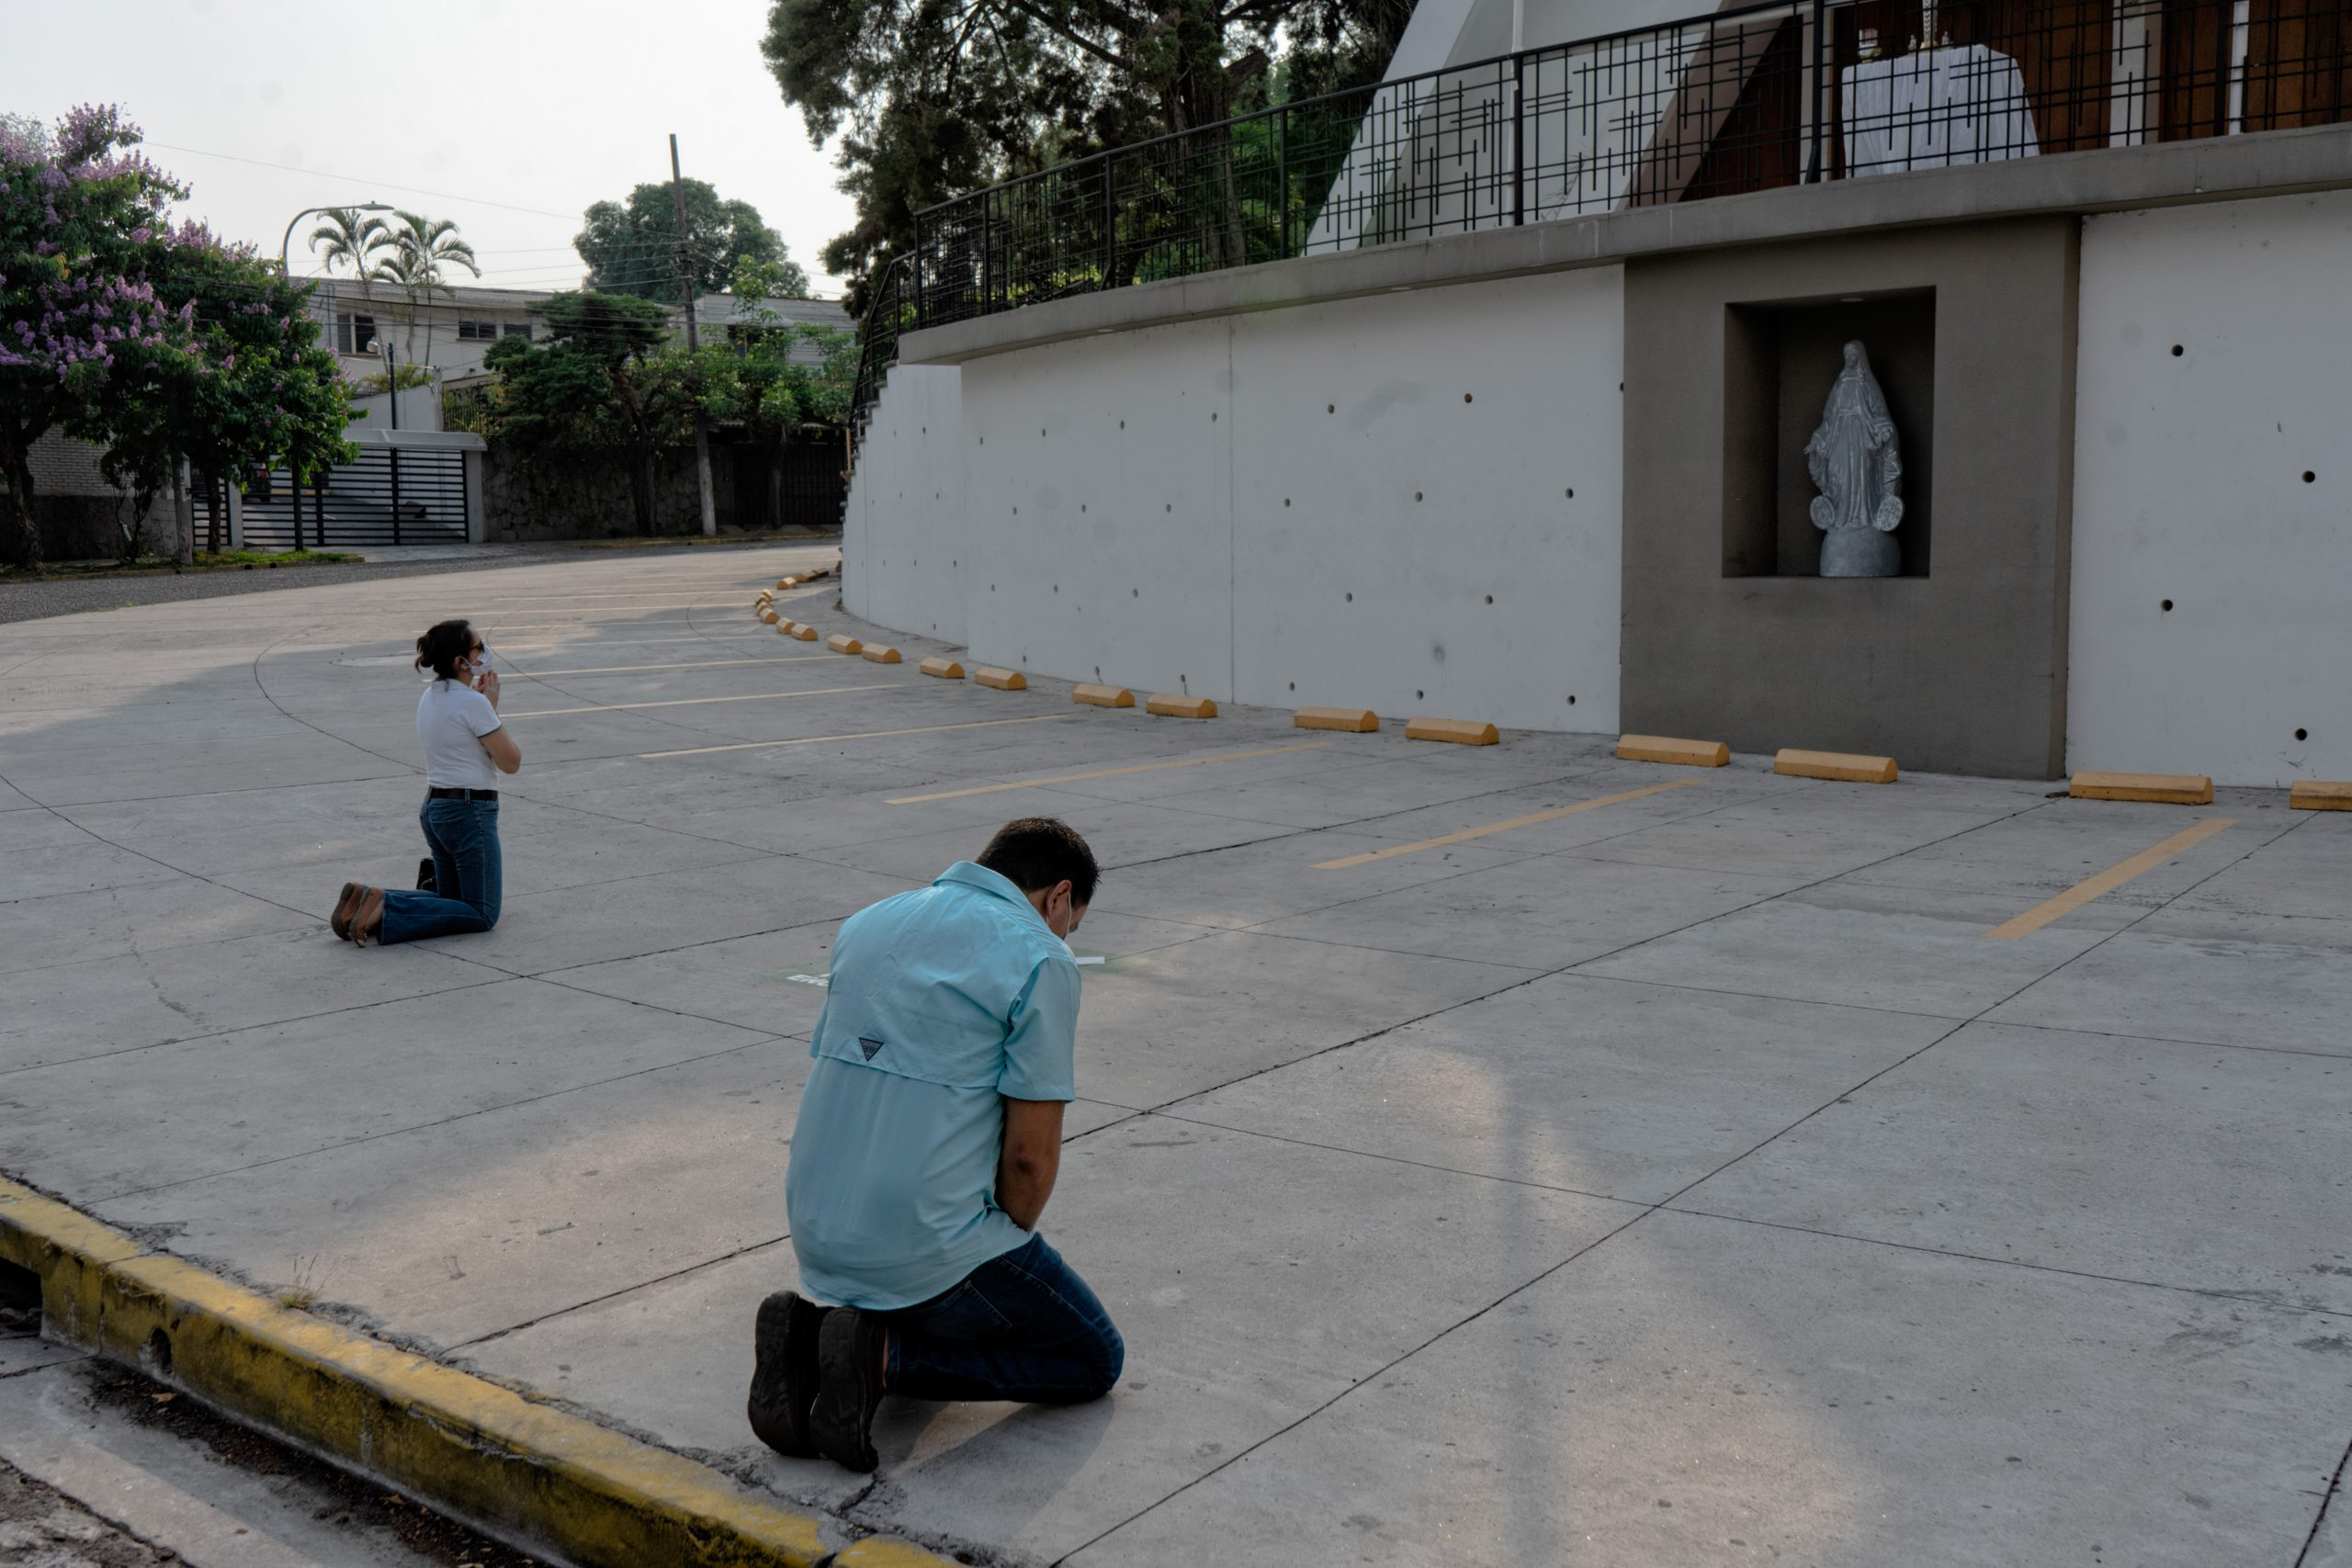 Catholic faithfuls pray outside of a church